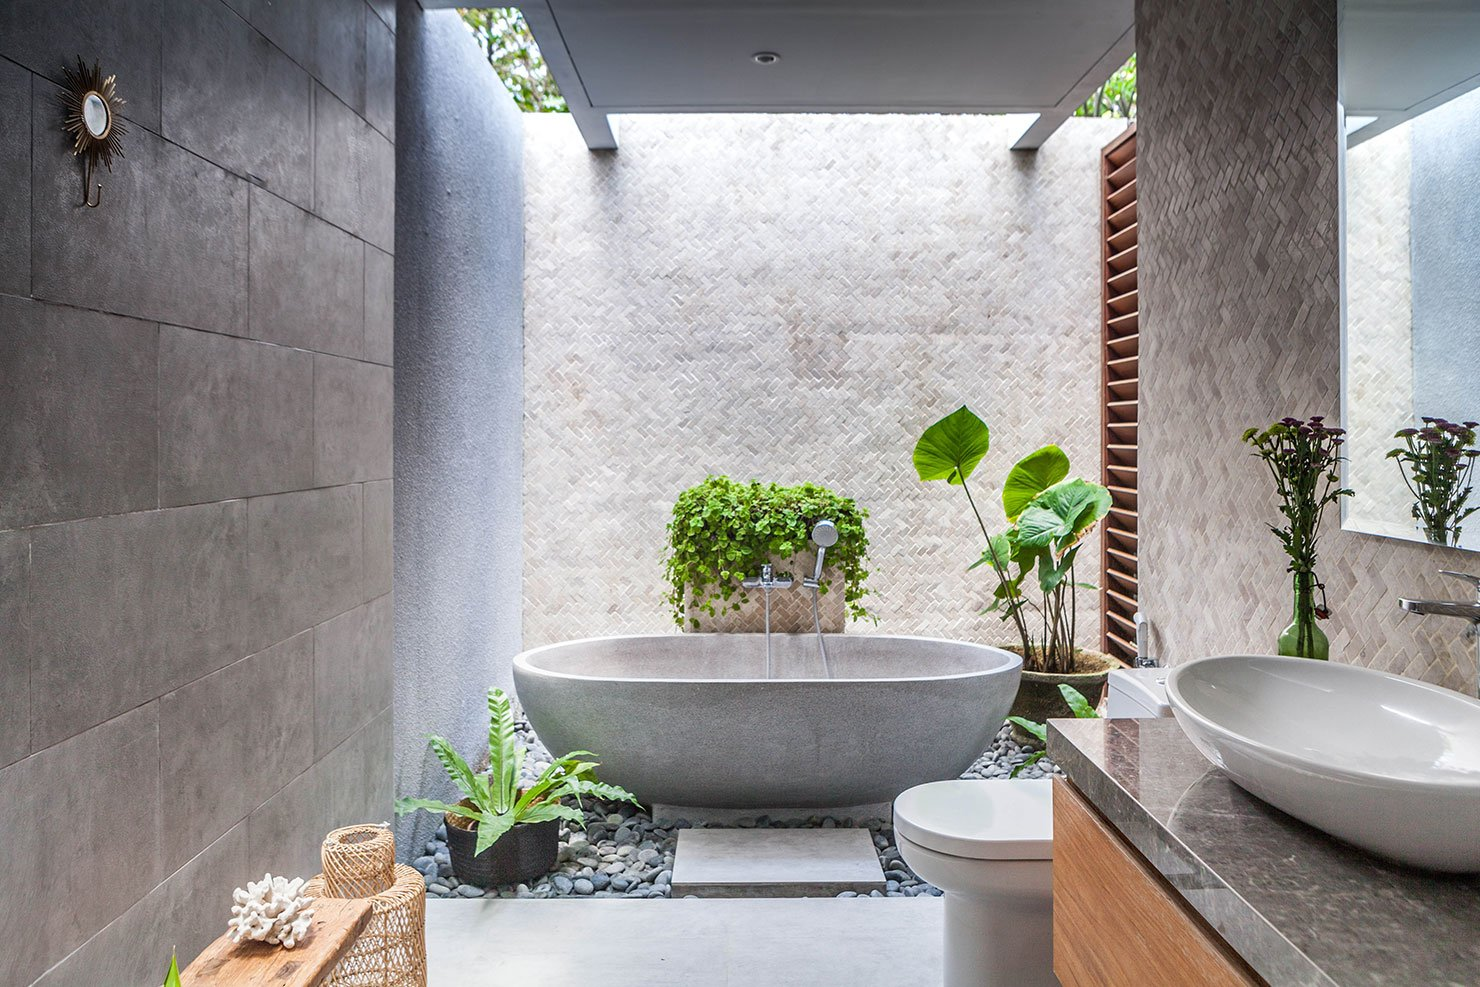 Bali Interiors uma karo canggu